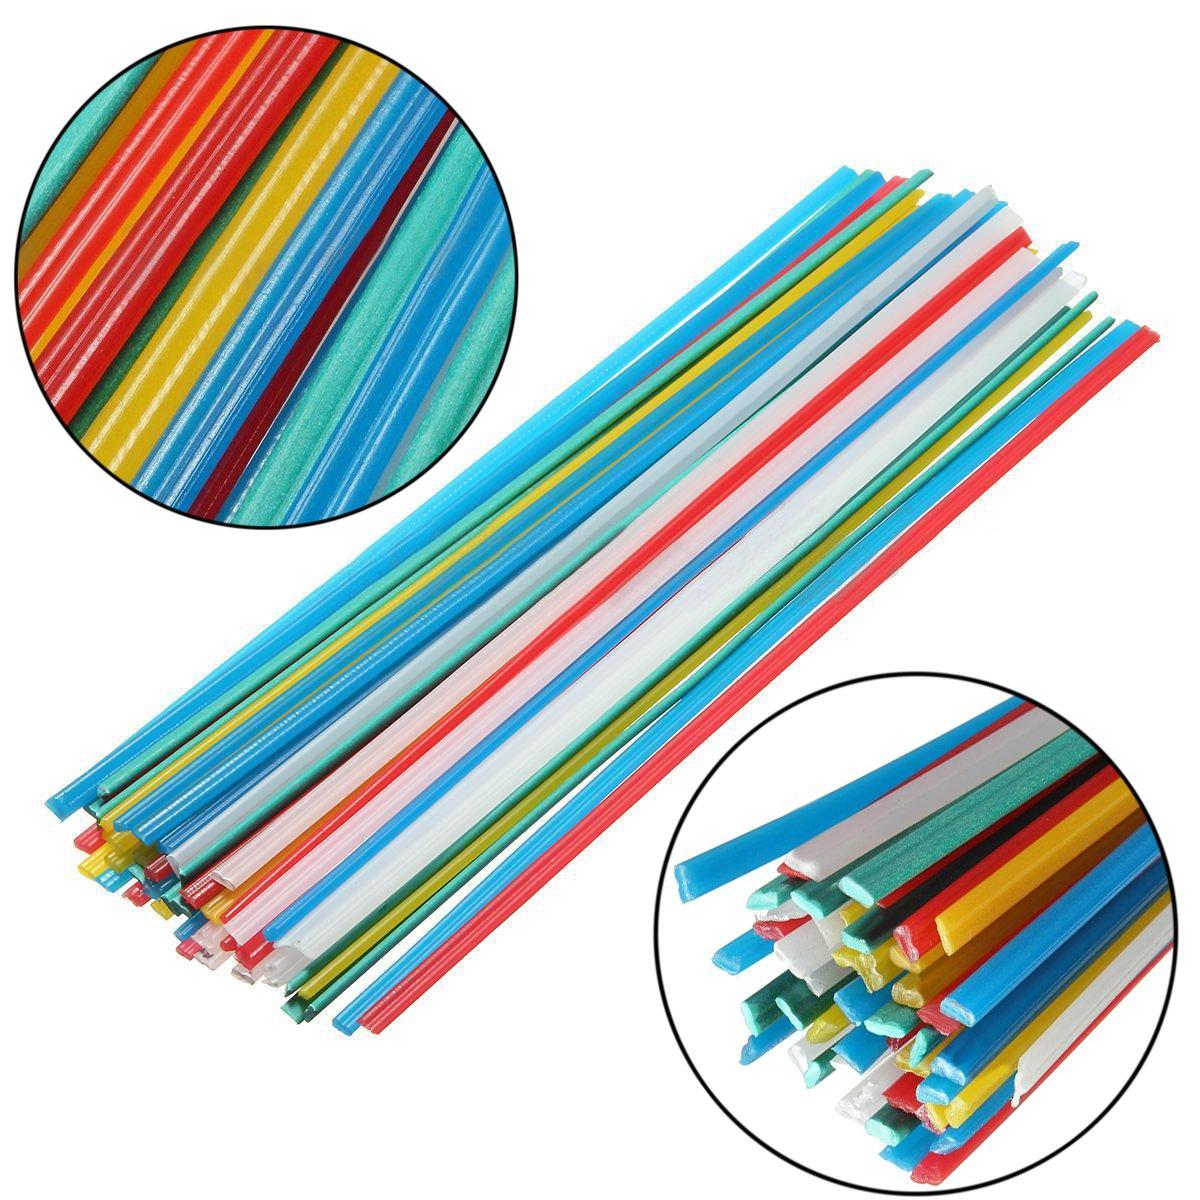 50pcs Plastic Welding Rods Welder Sticks Welding Purposes 5 Colors Mayitr